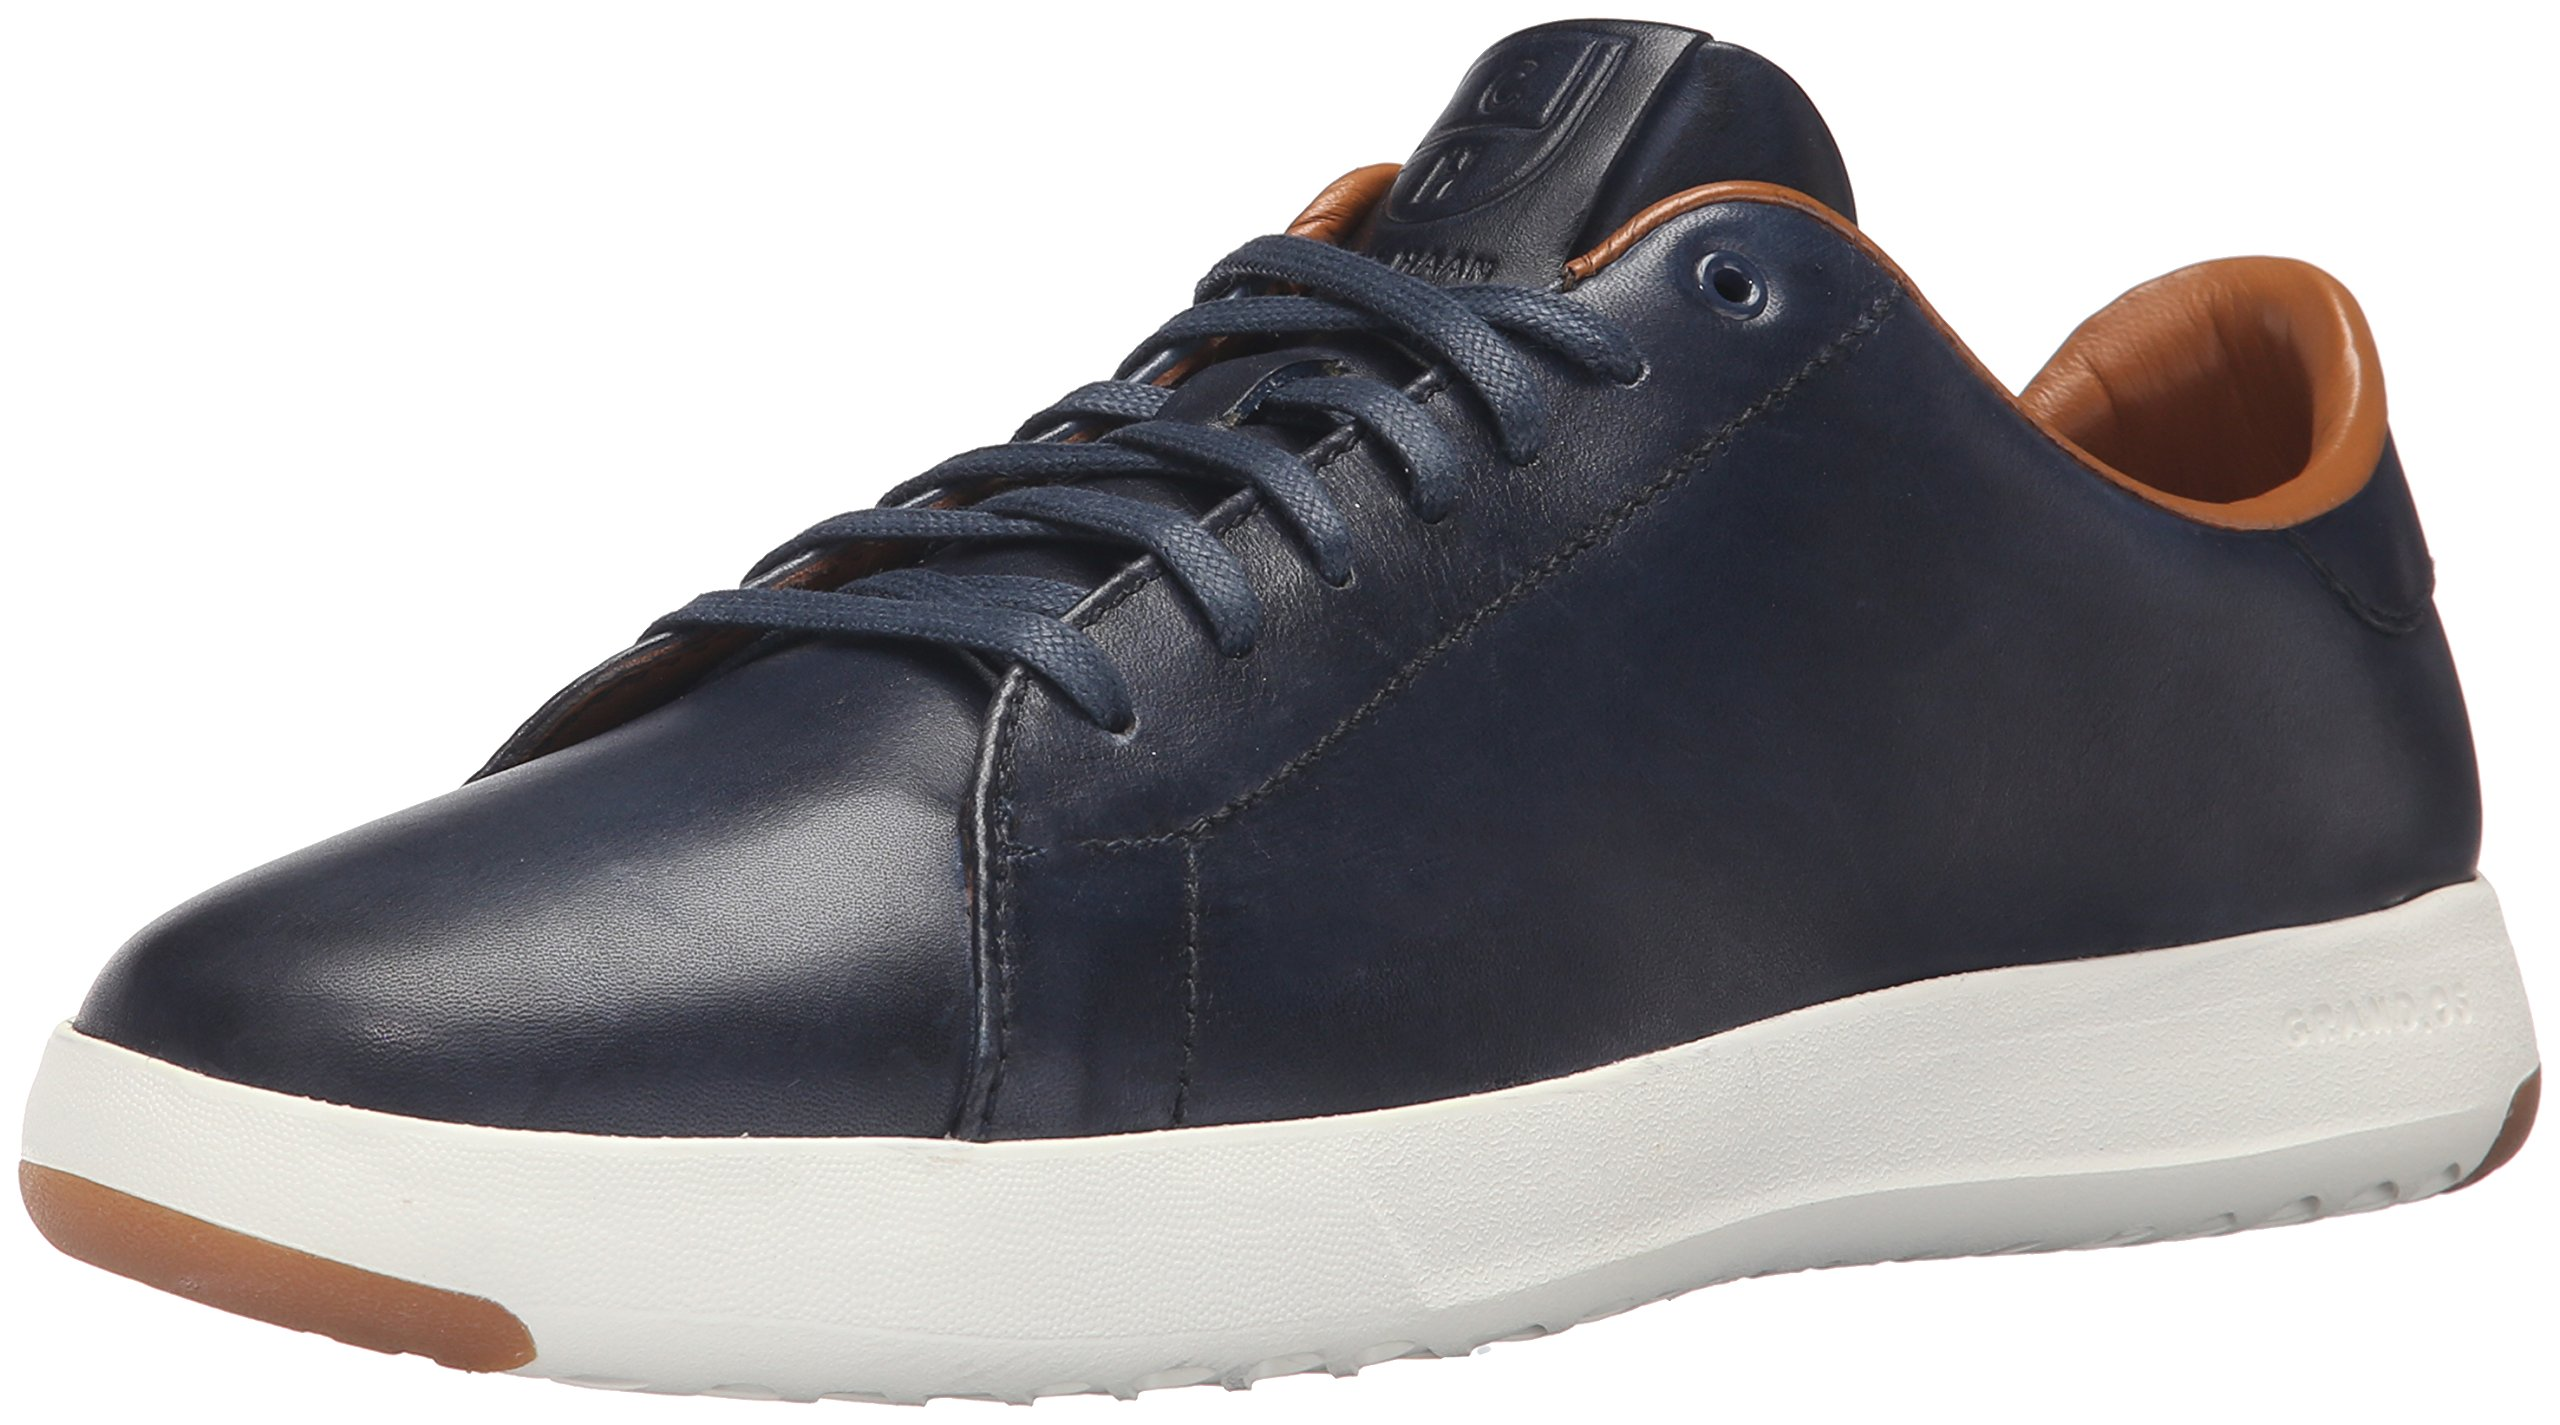 Cole Haan Men's Grandpro Tennis Fashion Sneaker, Blazer Blue Hand Stain, 7 M US by Cole Haan (Image #1)